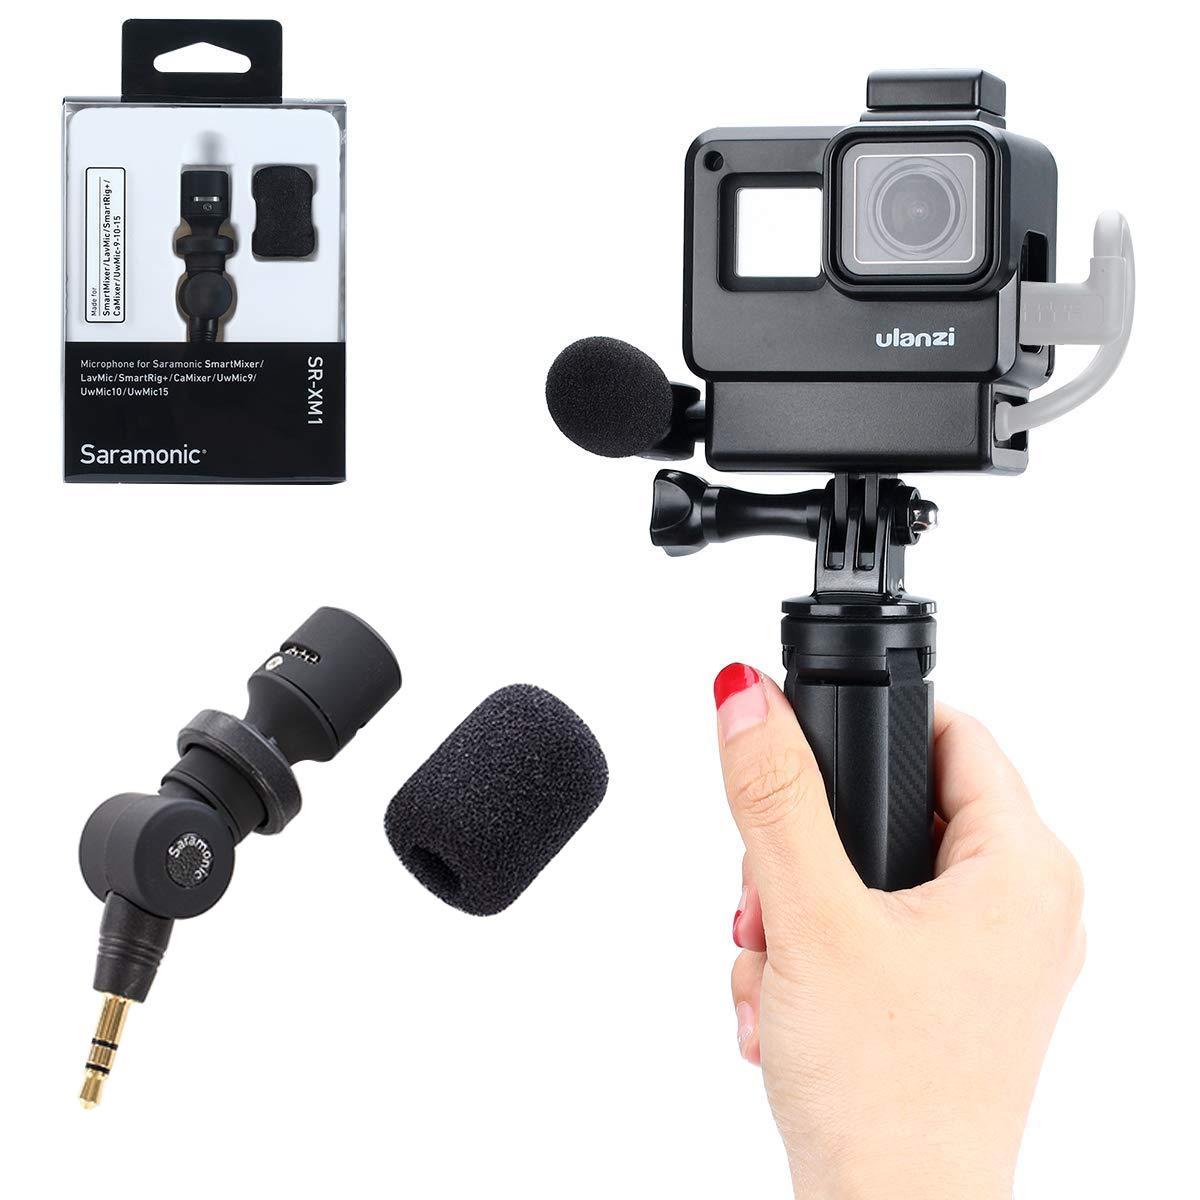 Vlog Setup for Gopro Hero 7 6 5, V2 Housing Case +Saramonic SR-XM1 3.5mm Wireless Video Recording Microphone + Mini Tripod Handle